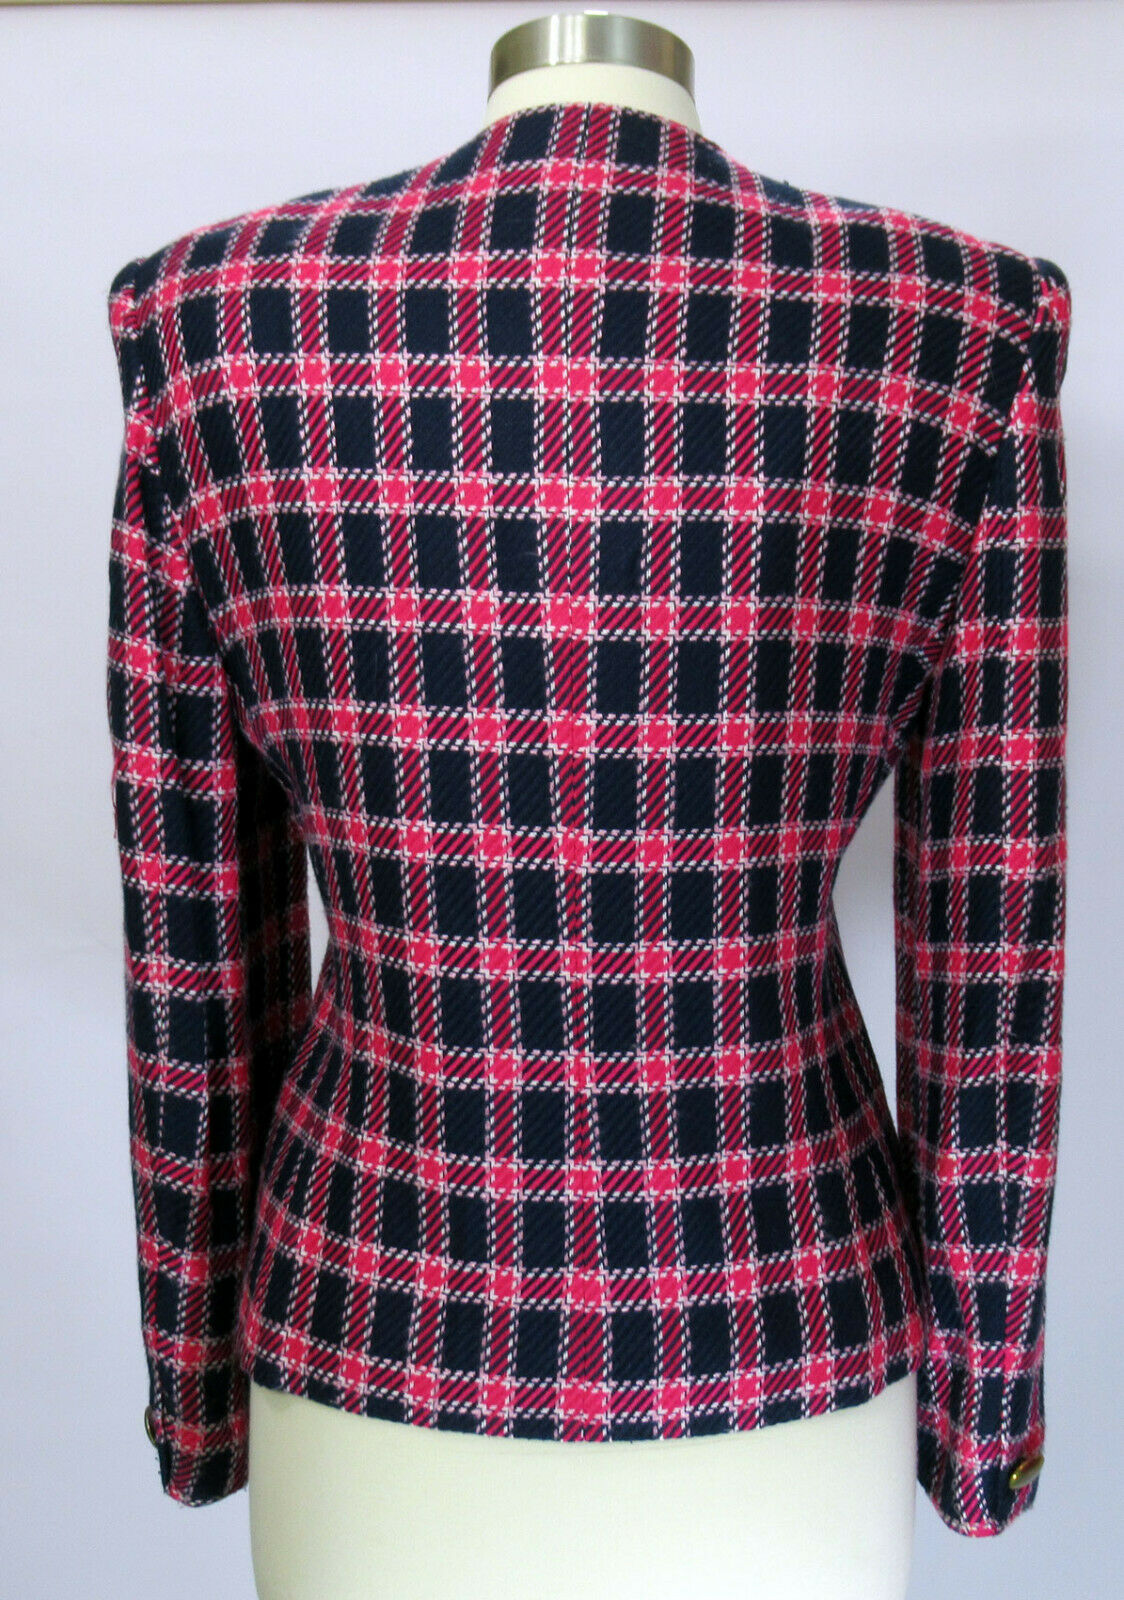 Vintage Evan Picone 1980s or 1990s blazer jacket … - image 3